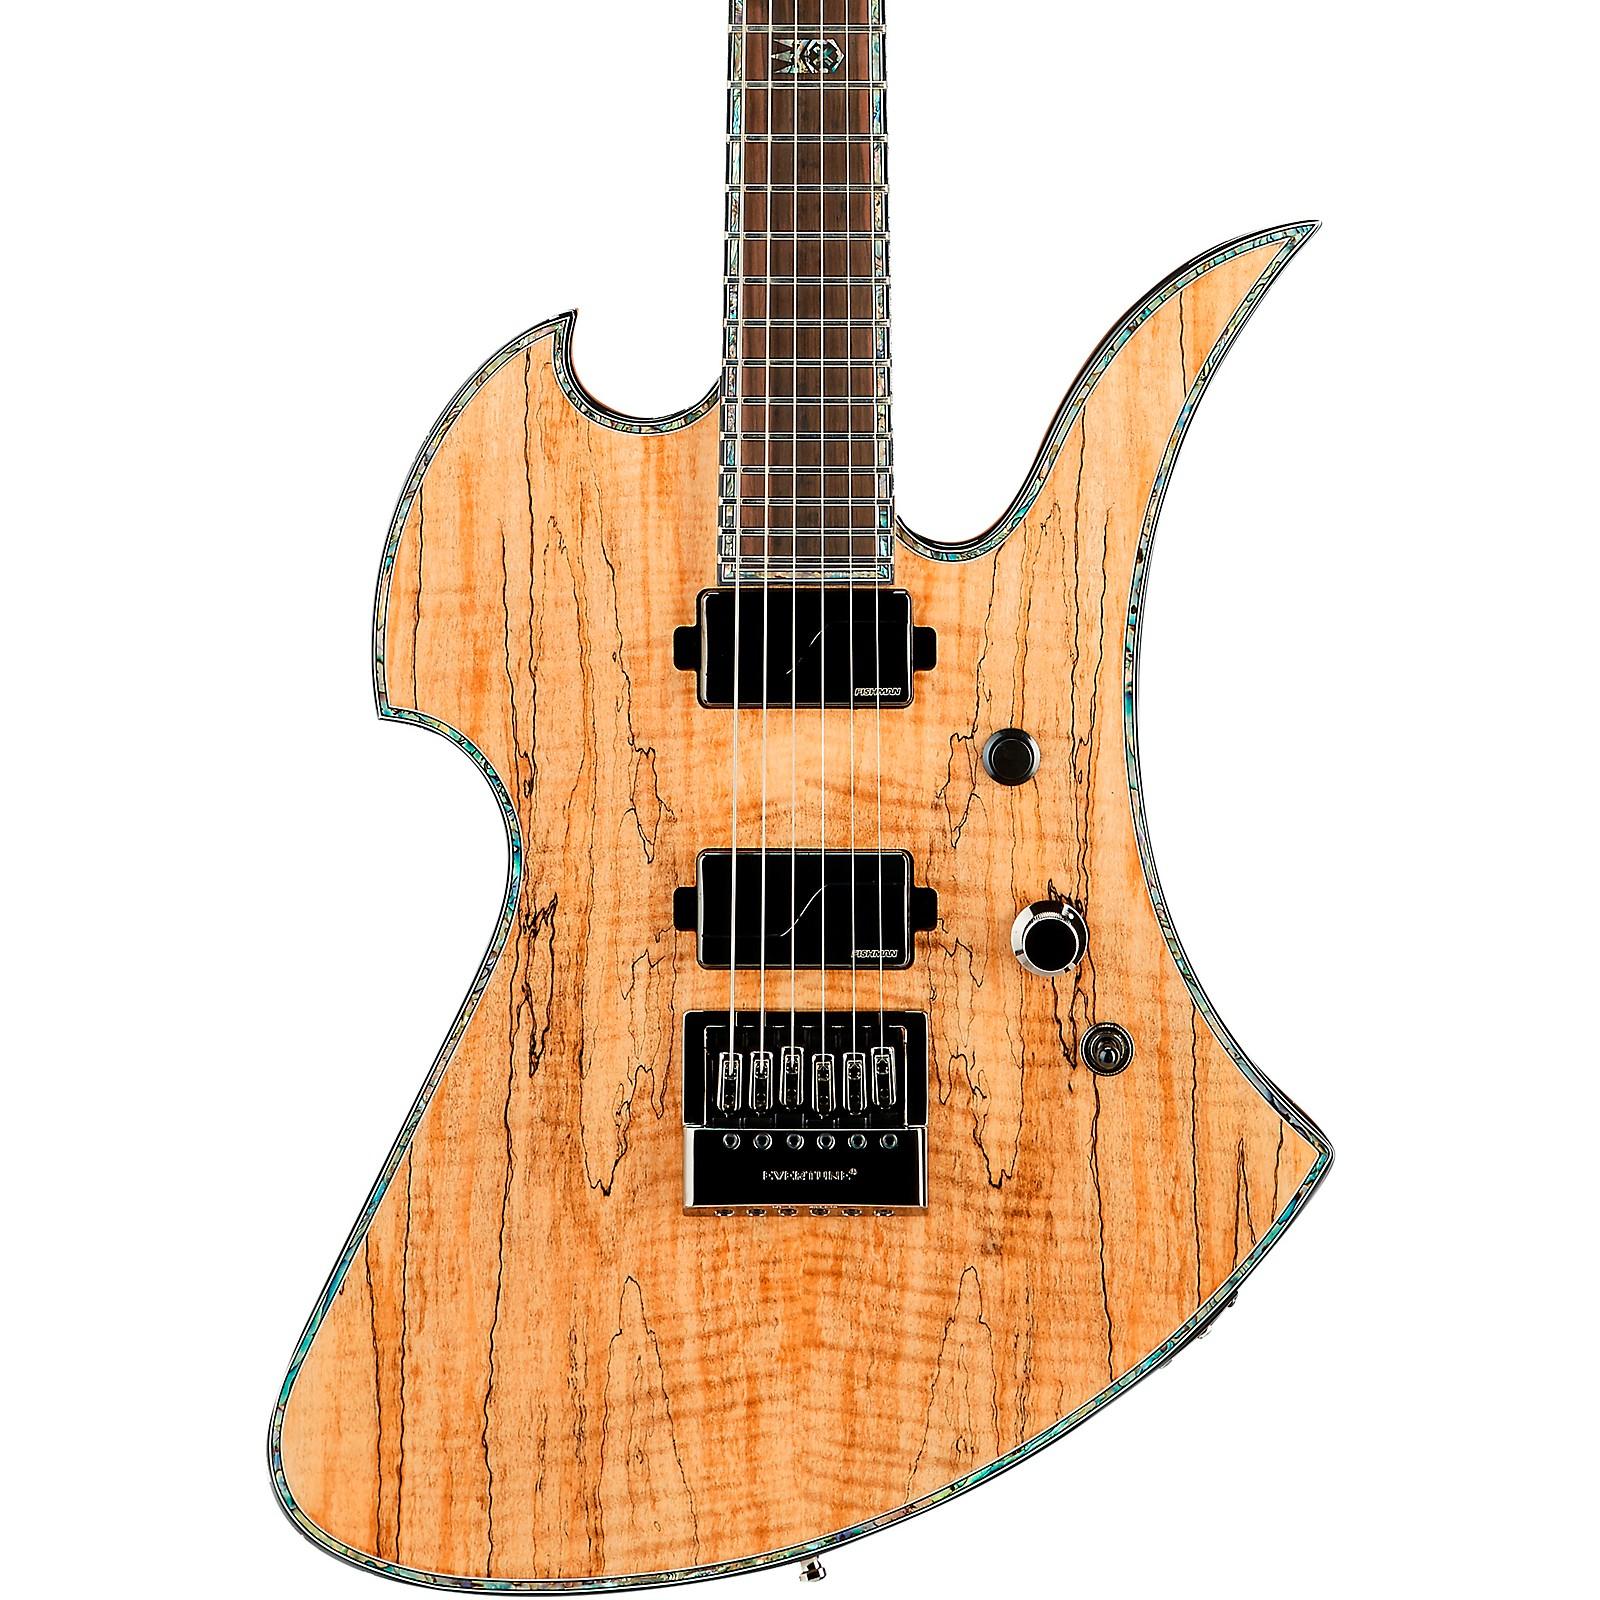 B.C. Rich Mockingbird Extreme Exotic with Evertune Bridge Electric Guitar